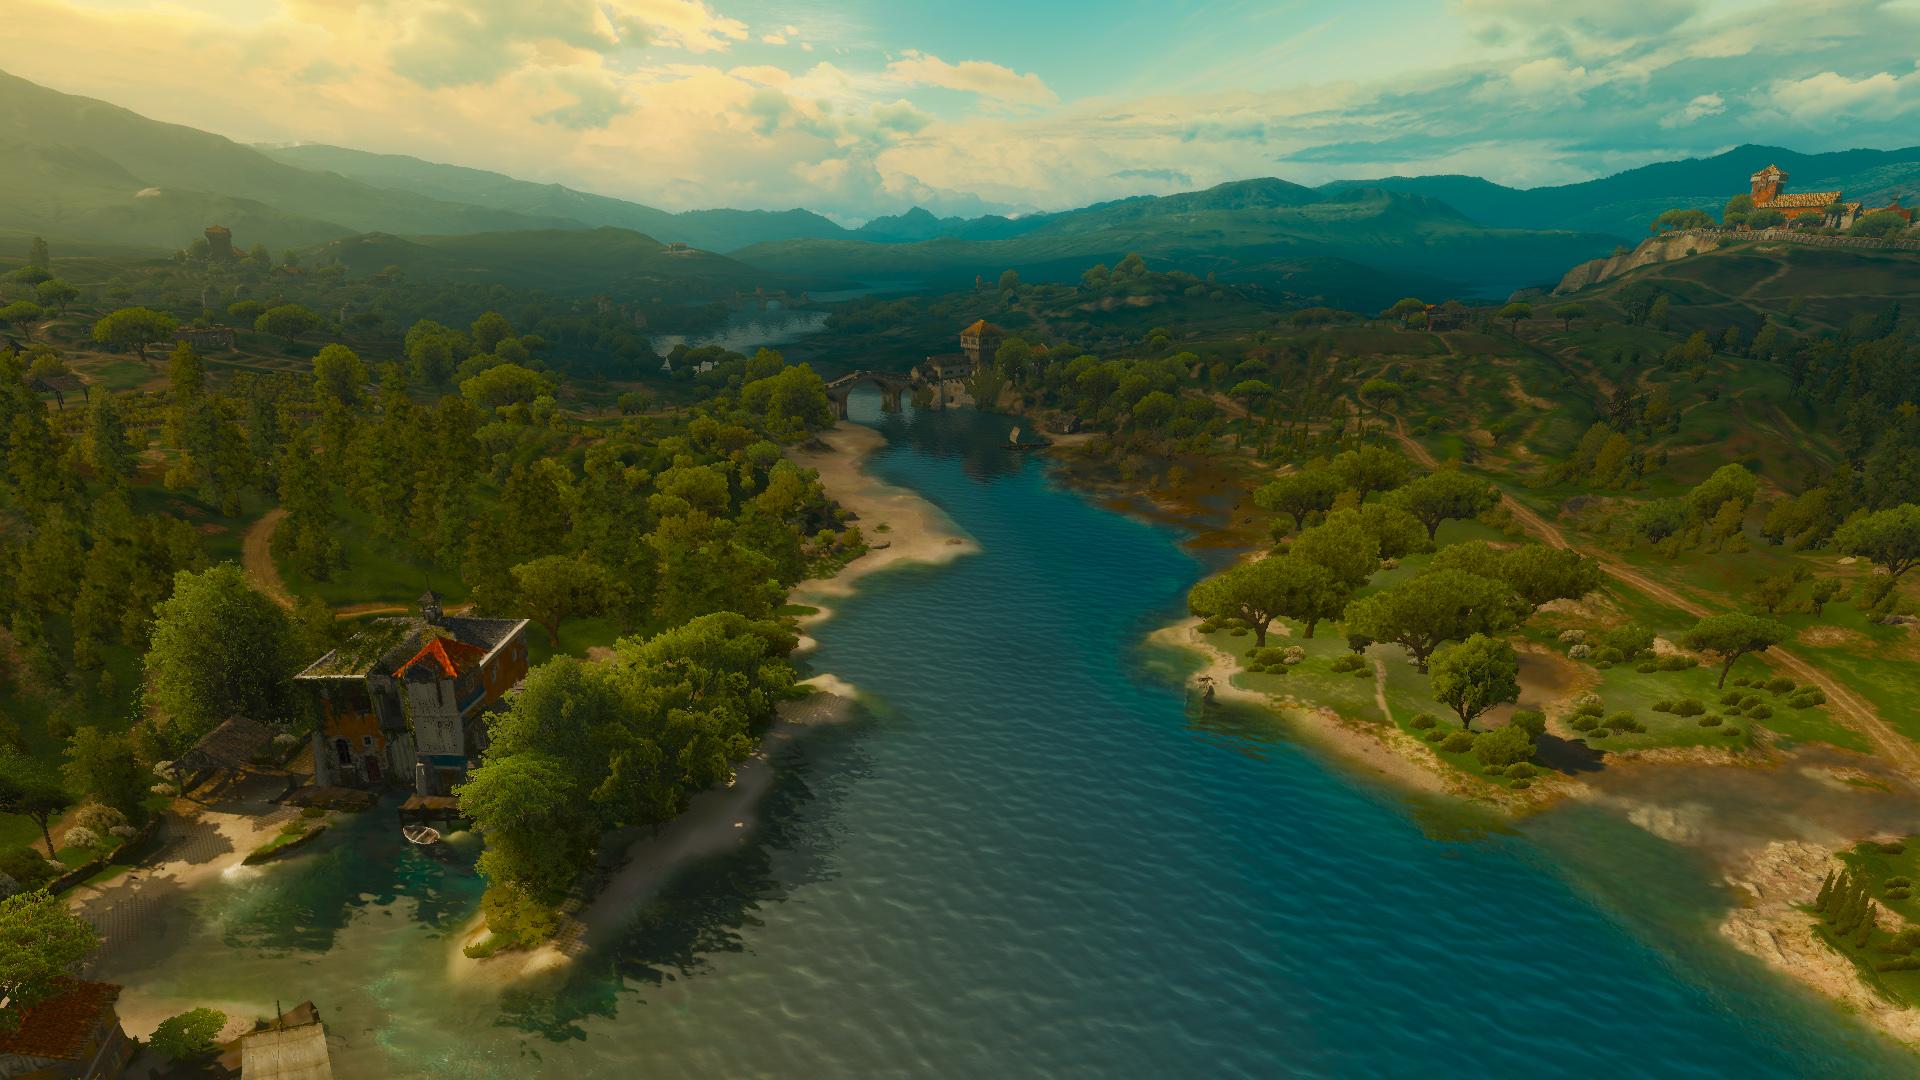 Sansretour River